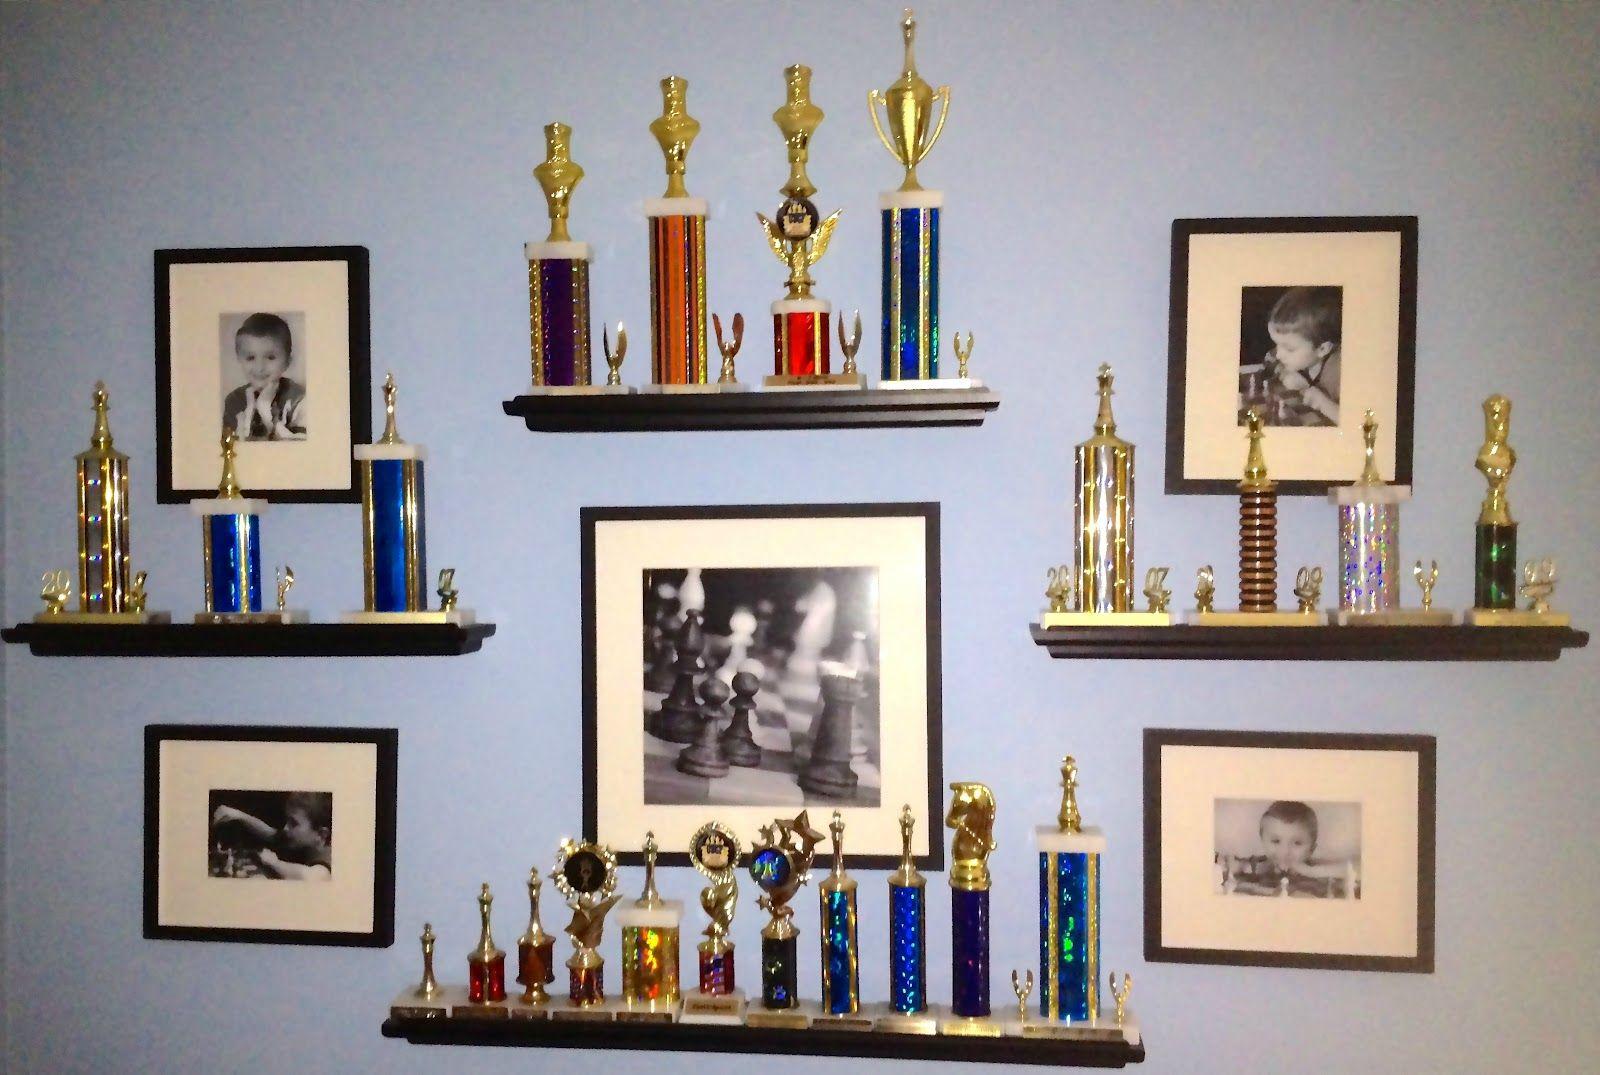 Kids Awards & Achievements Decor